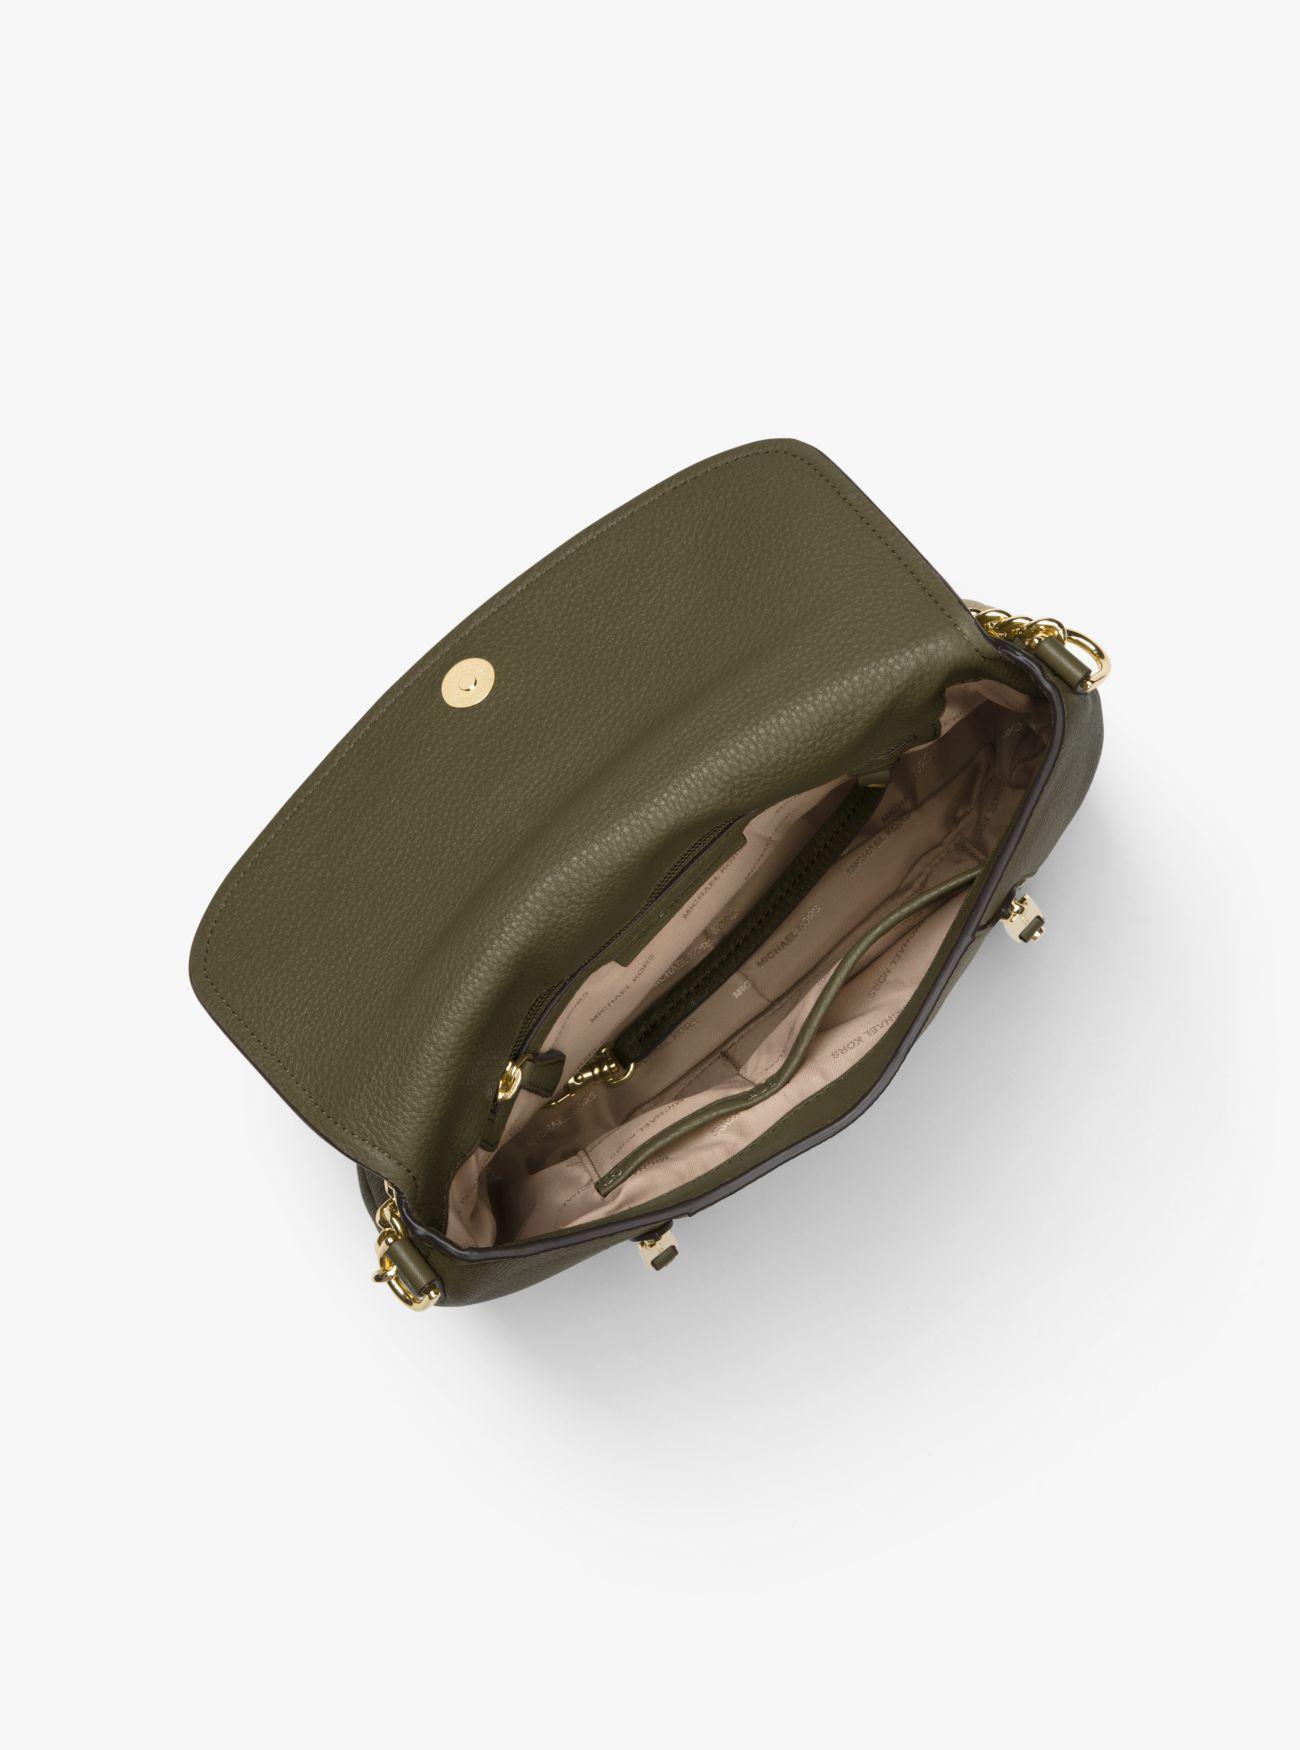 ddb4666c1291 Lyst - MICHAEL Michael Kors Evie Medium Pebbled Leather Shoulder Bag ...